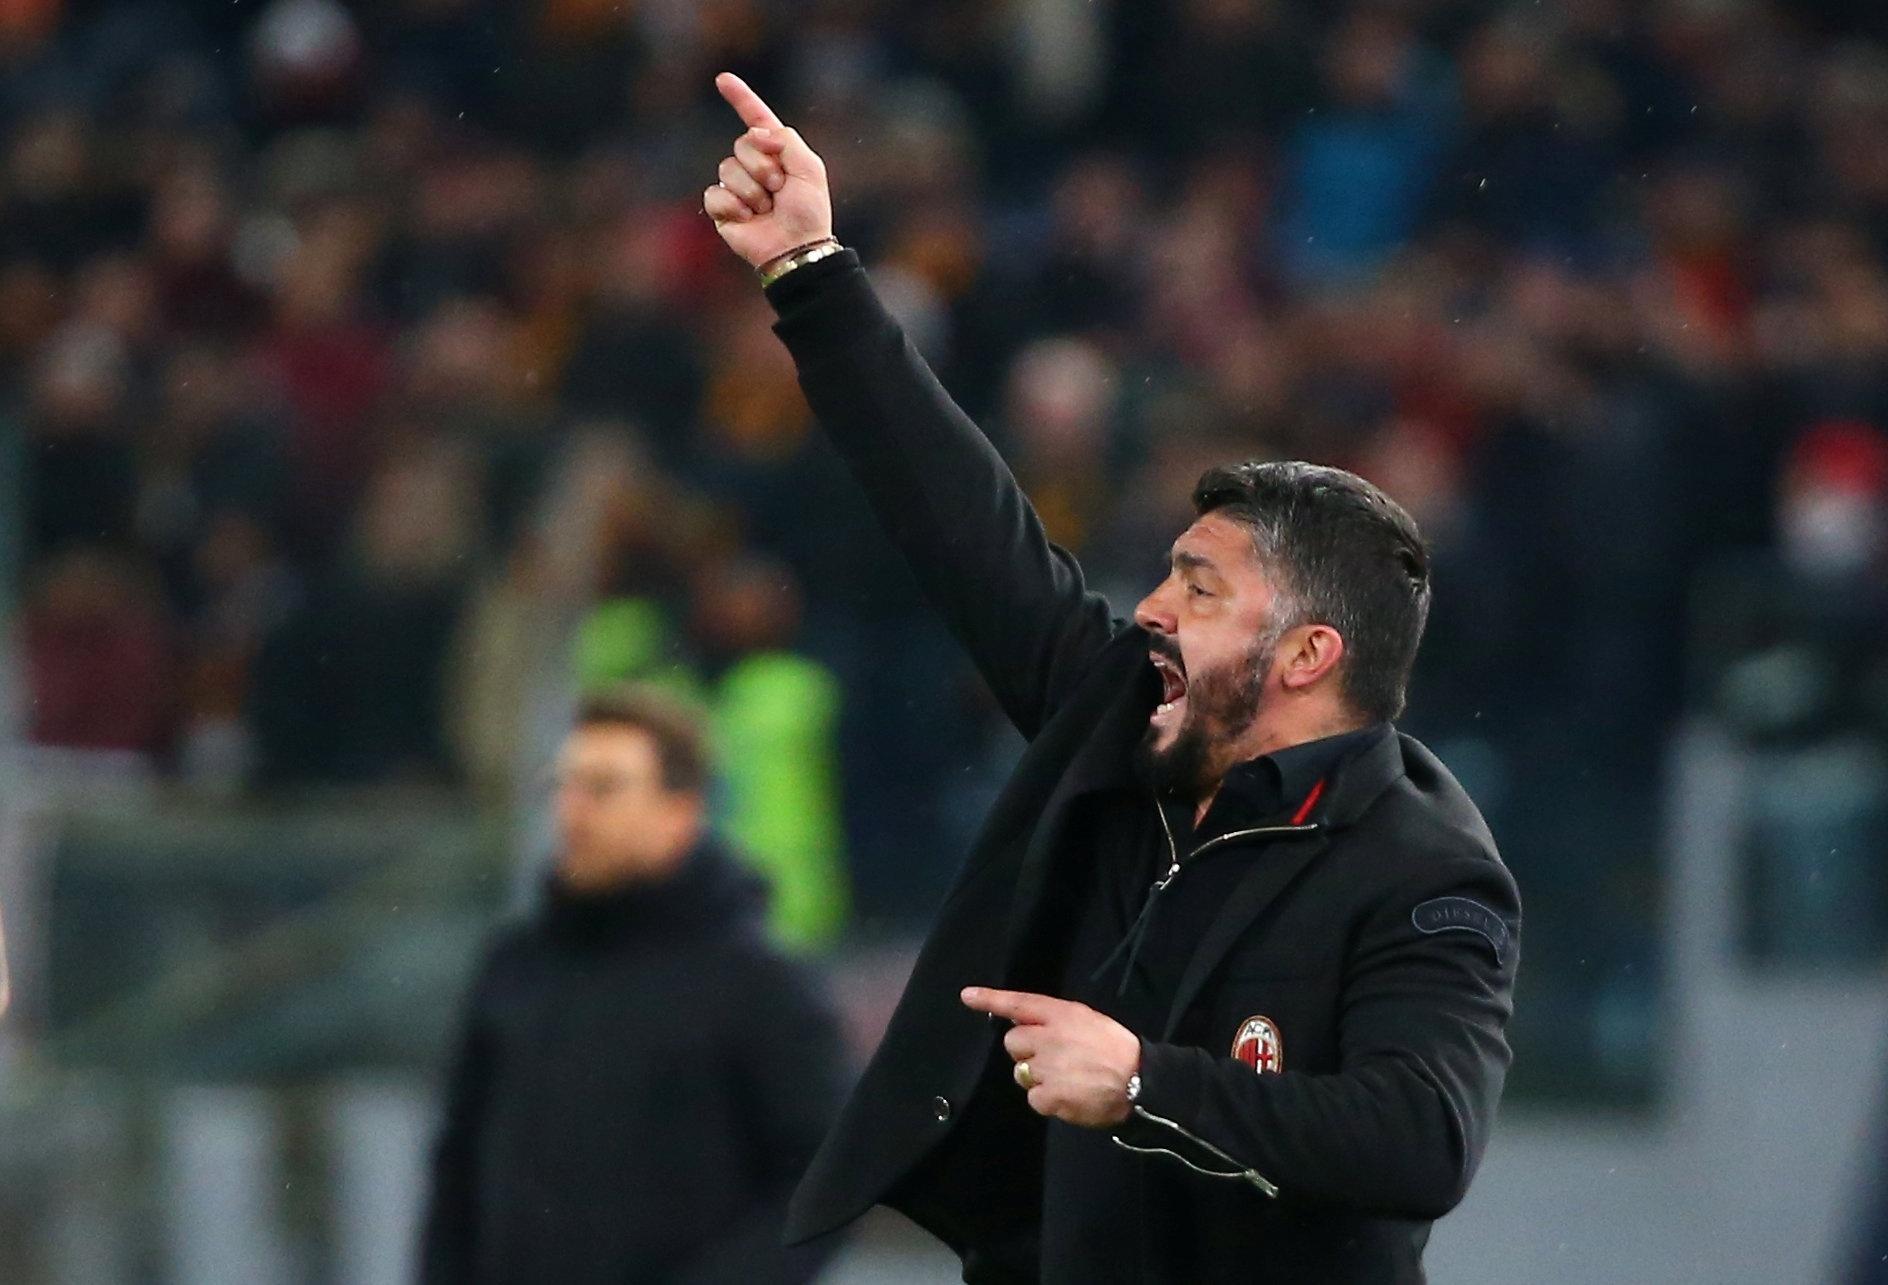 Gattuso gesticula na vitória do Milan de 2 a 0 sobre a Roma